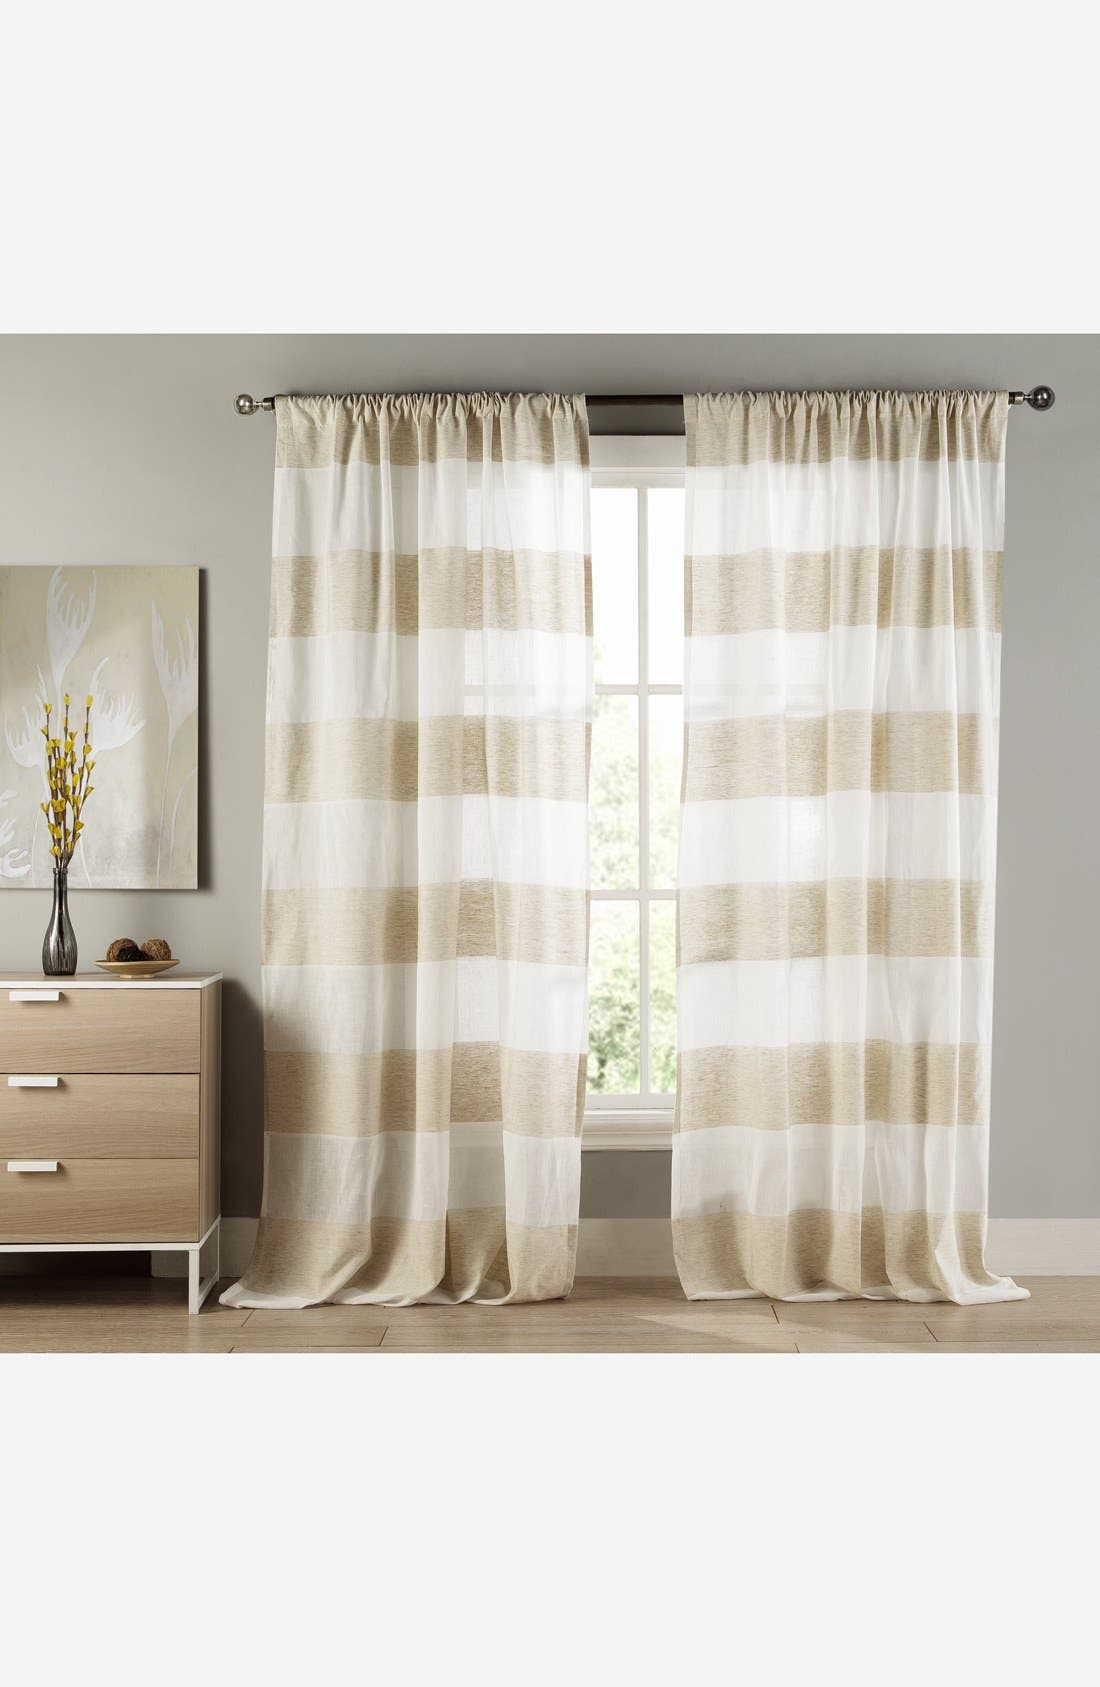 Alternate Image 1 Selected - Duck River Textile 'Lydelle' Cabana Stripe Window Panels (Set of 2)